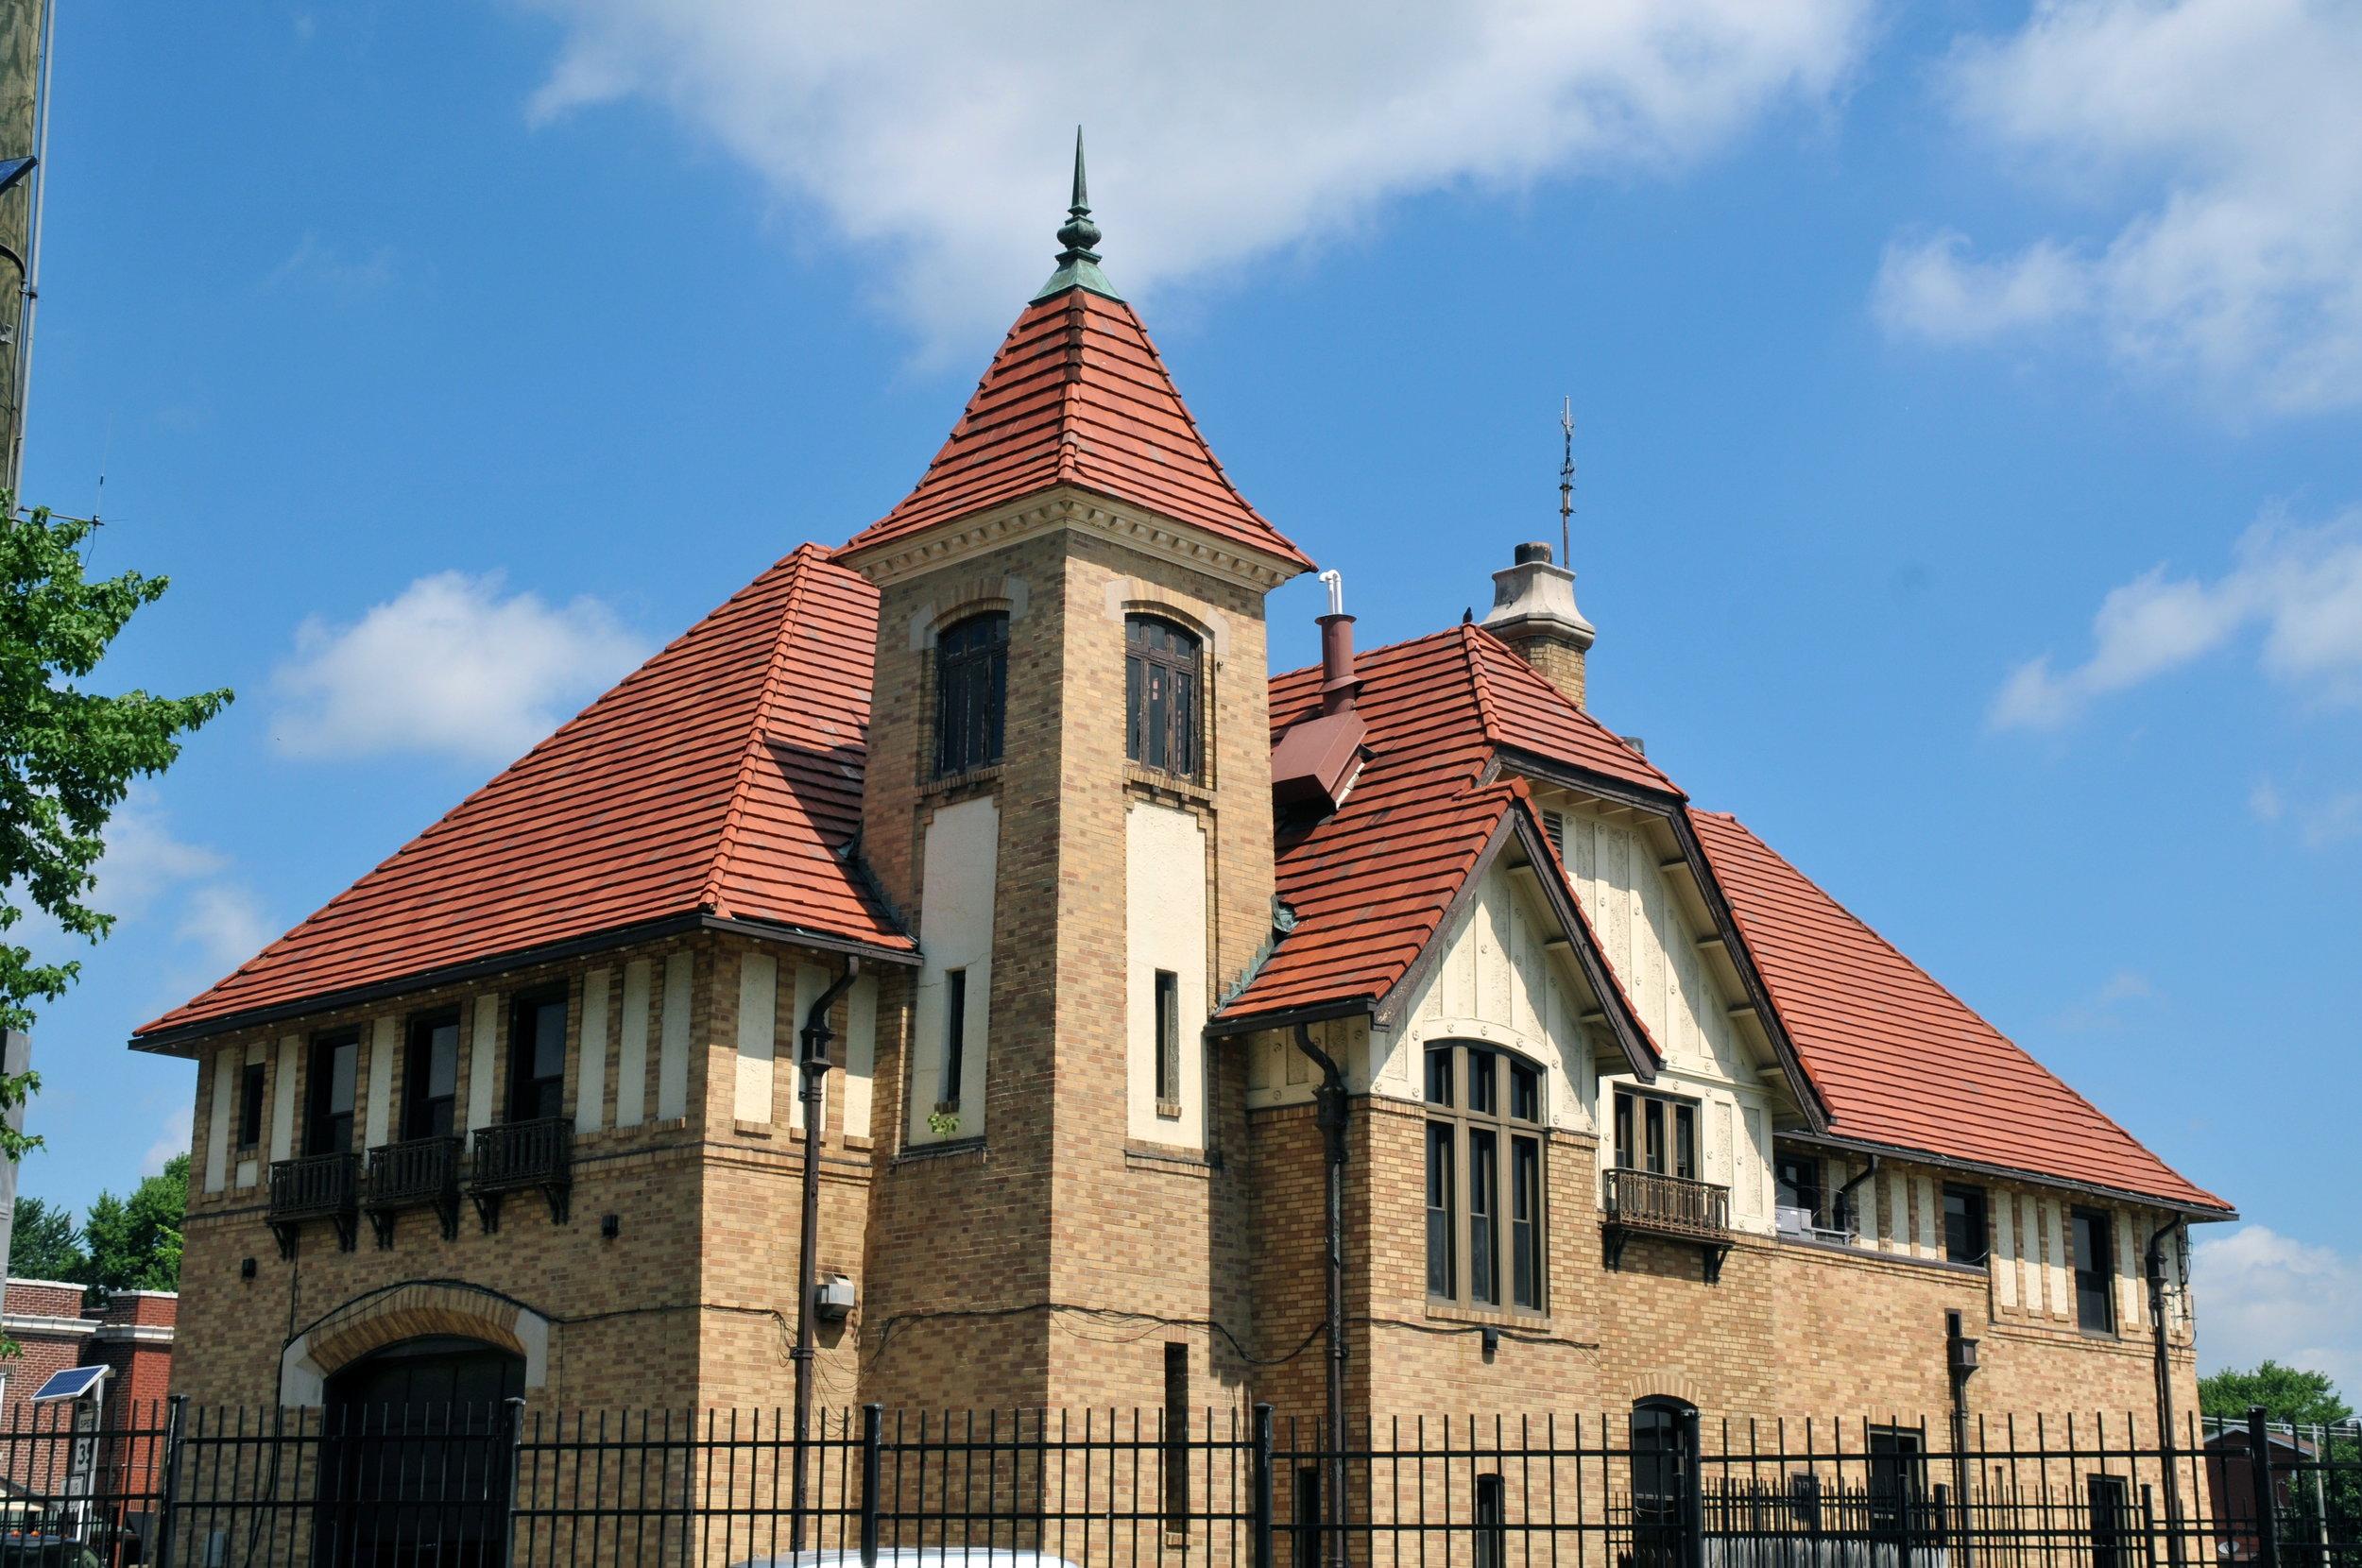 Firehouse #36 - Princeton Heights